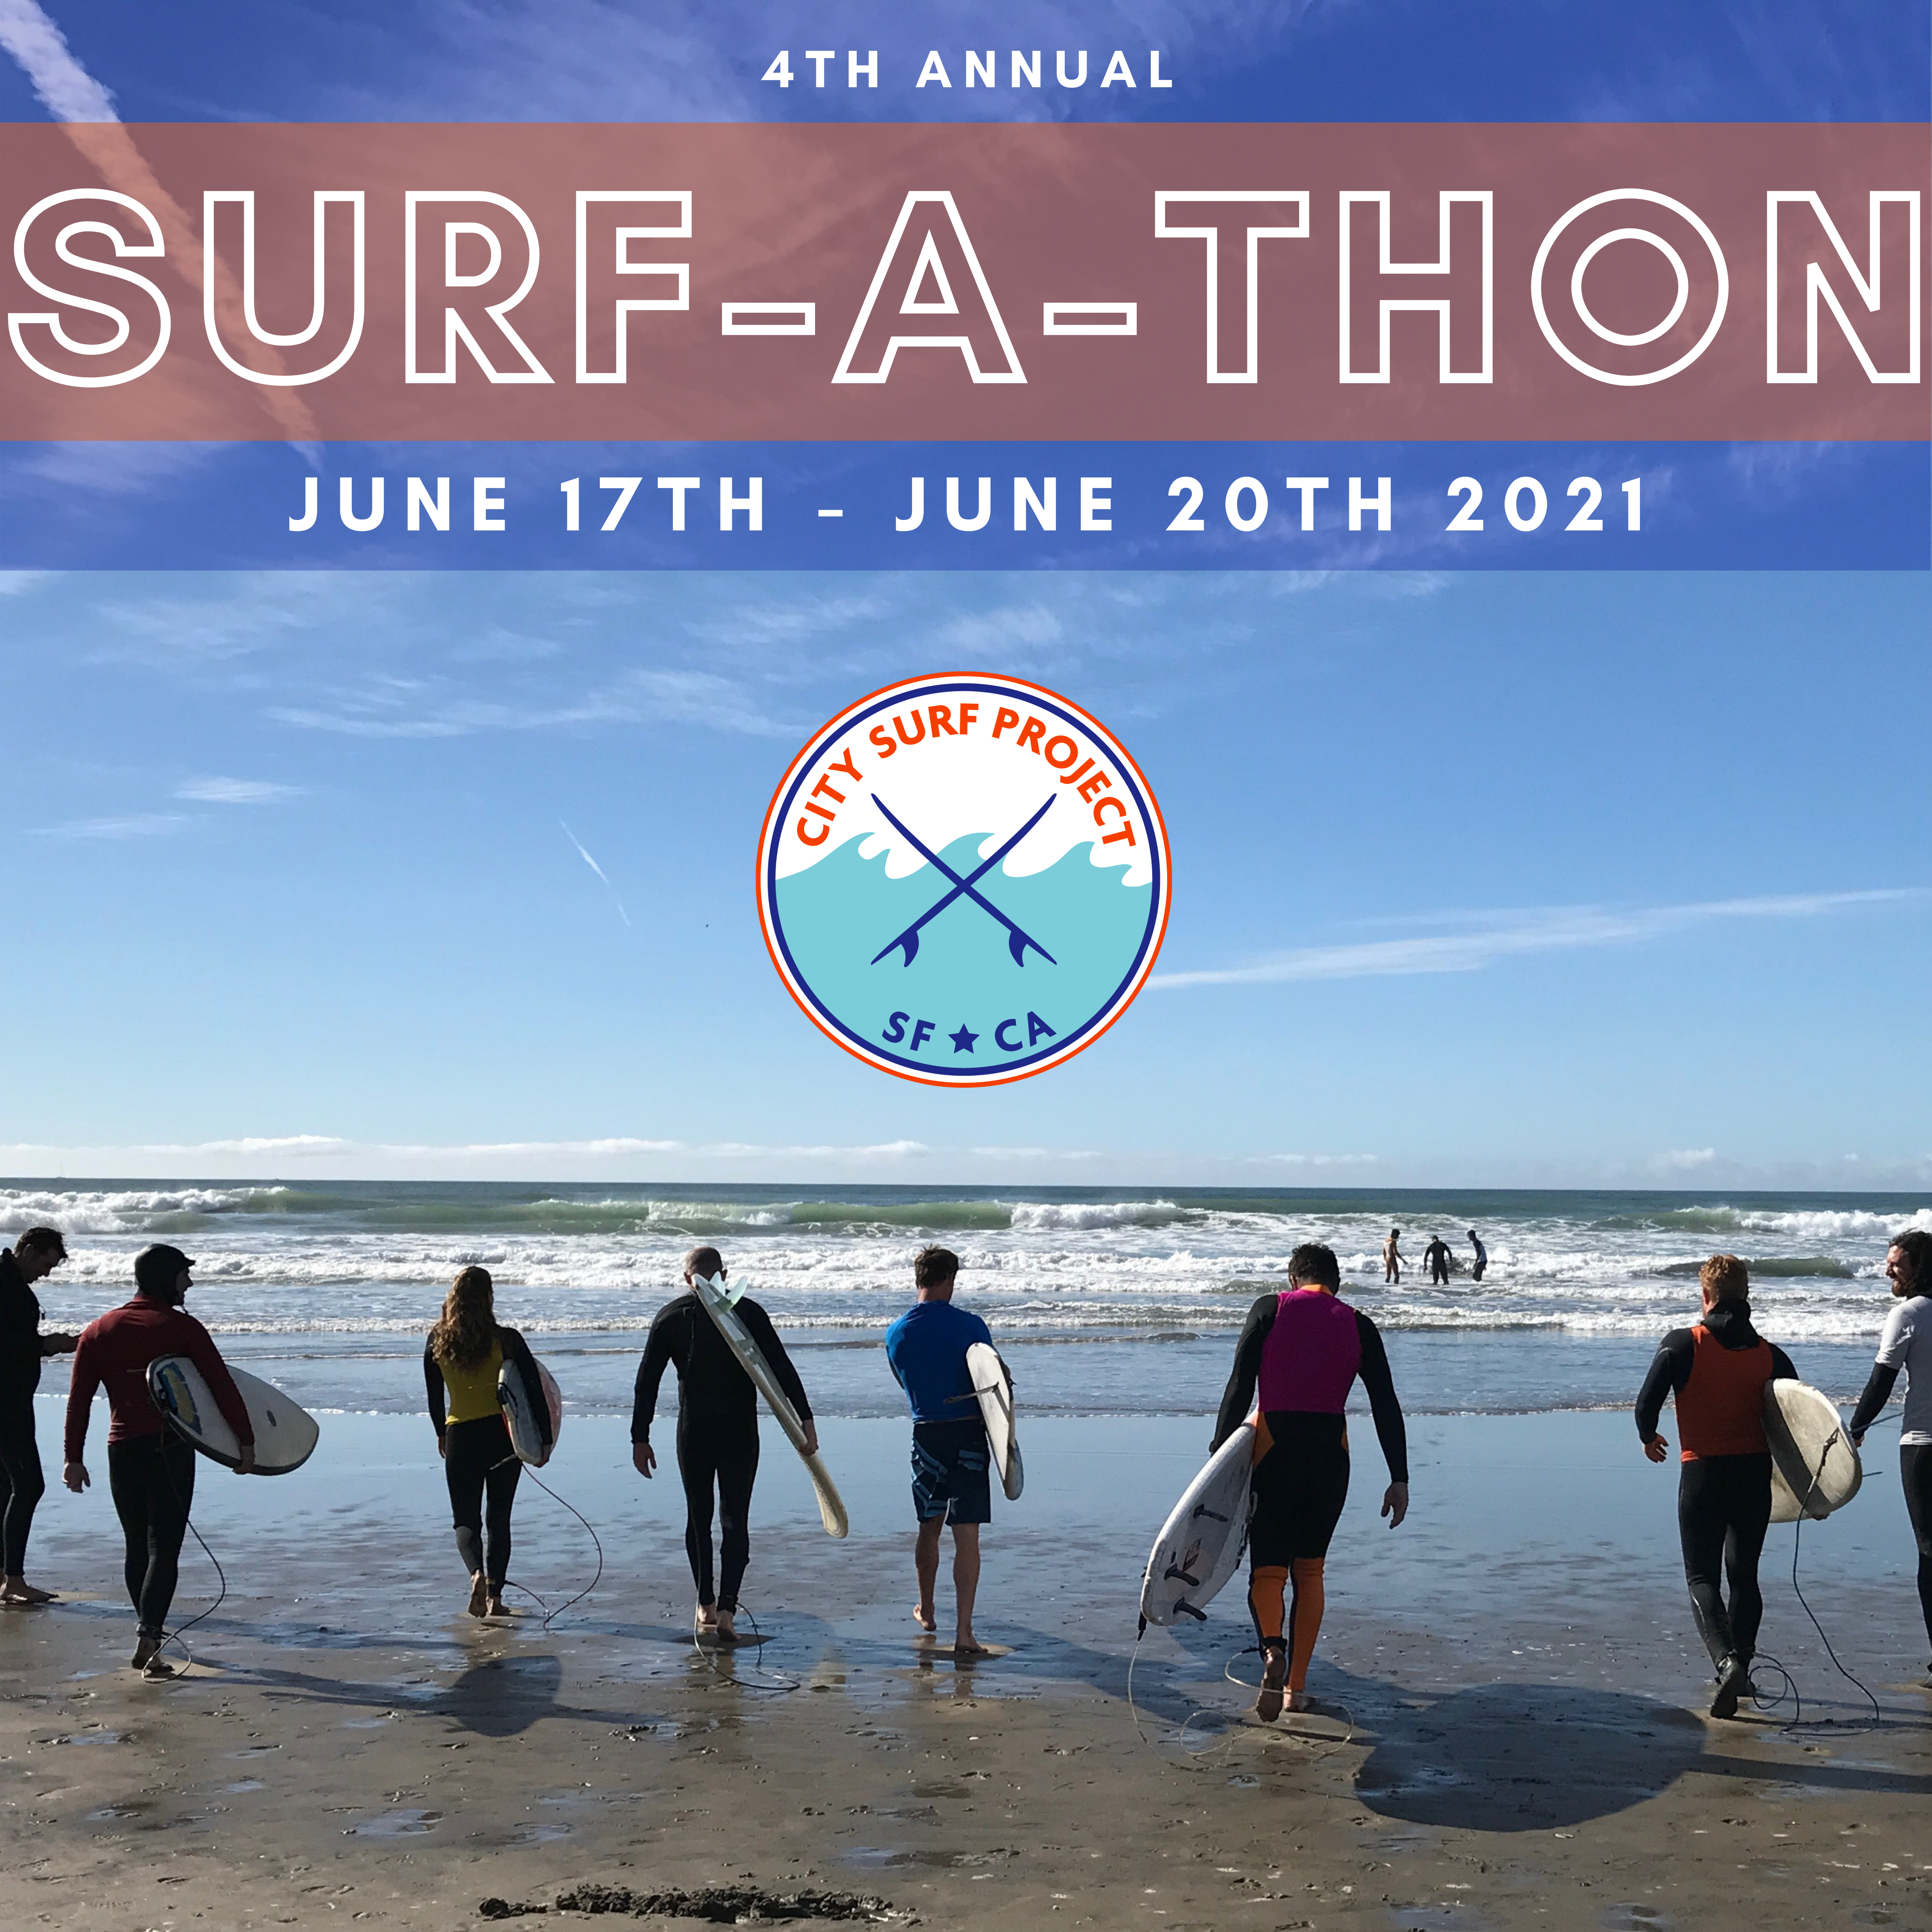 SurfAThon (Post Content)